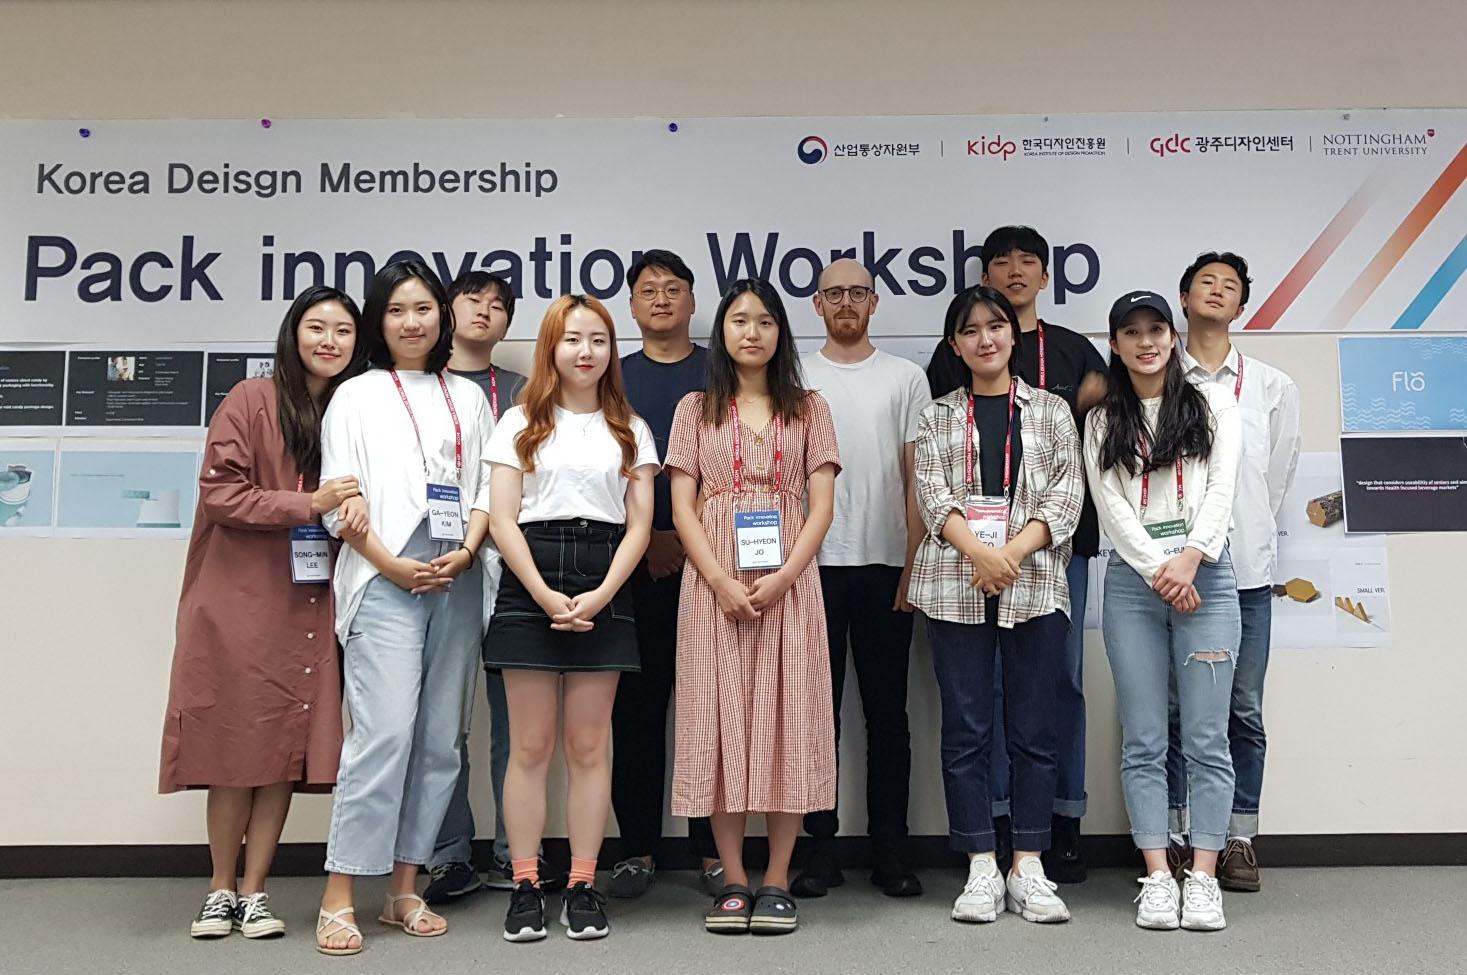 Undergraduate design students from the Korean Design Membership programme